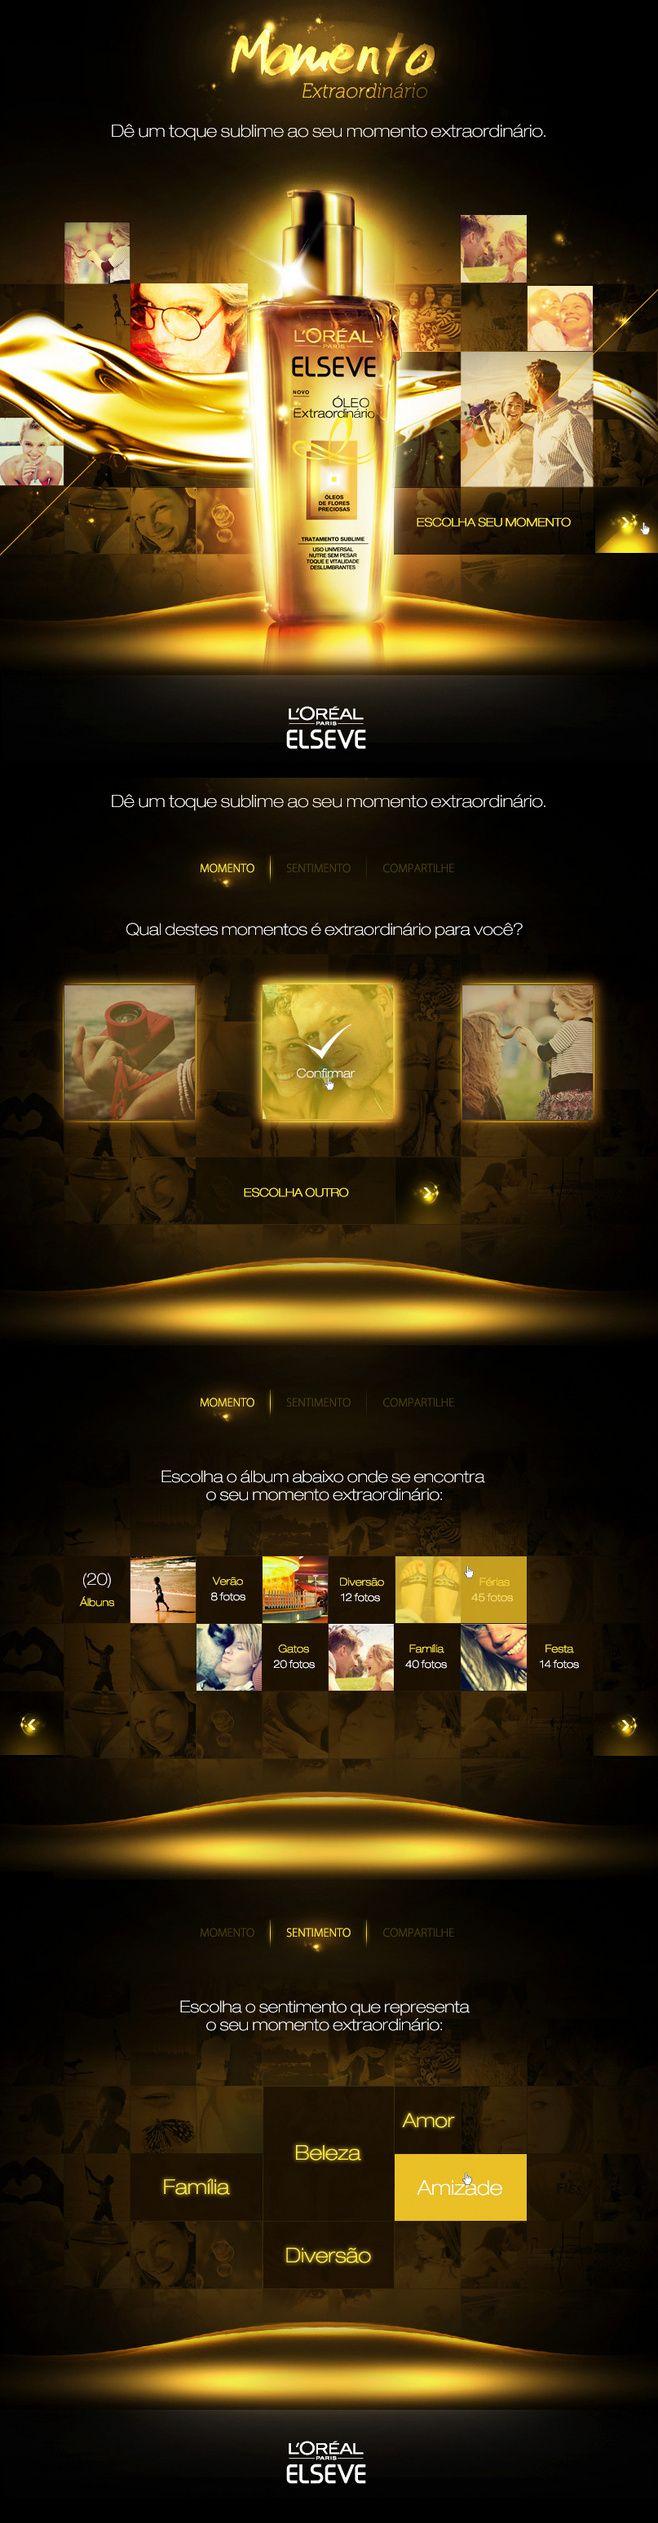 L'Oreal Momento Extraordinário | #webdesign #it #web #design #animation #layout #userinterface #website #webdesign repinned by www.BlickeDeeler.de | Visit our website www.blickedeeler.de/leistungen/webdesign